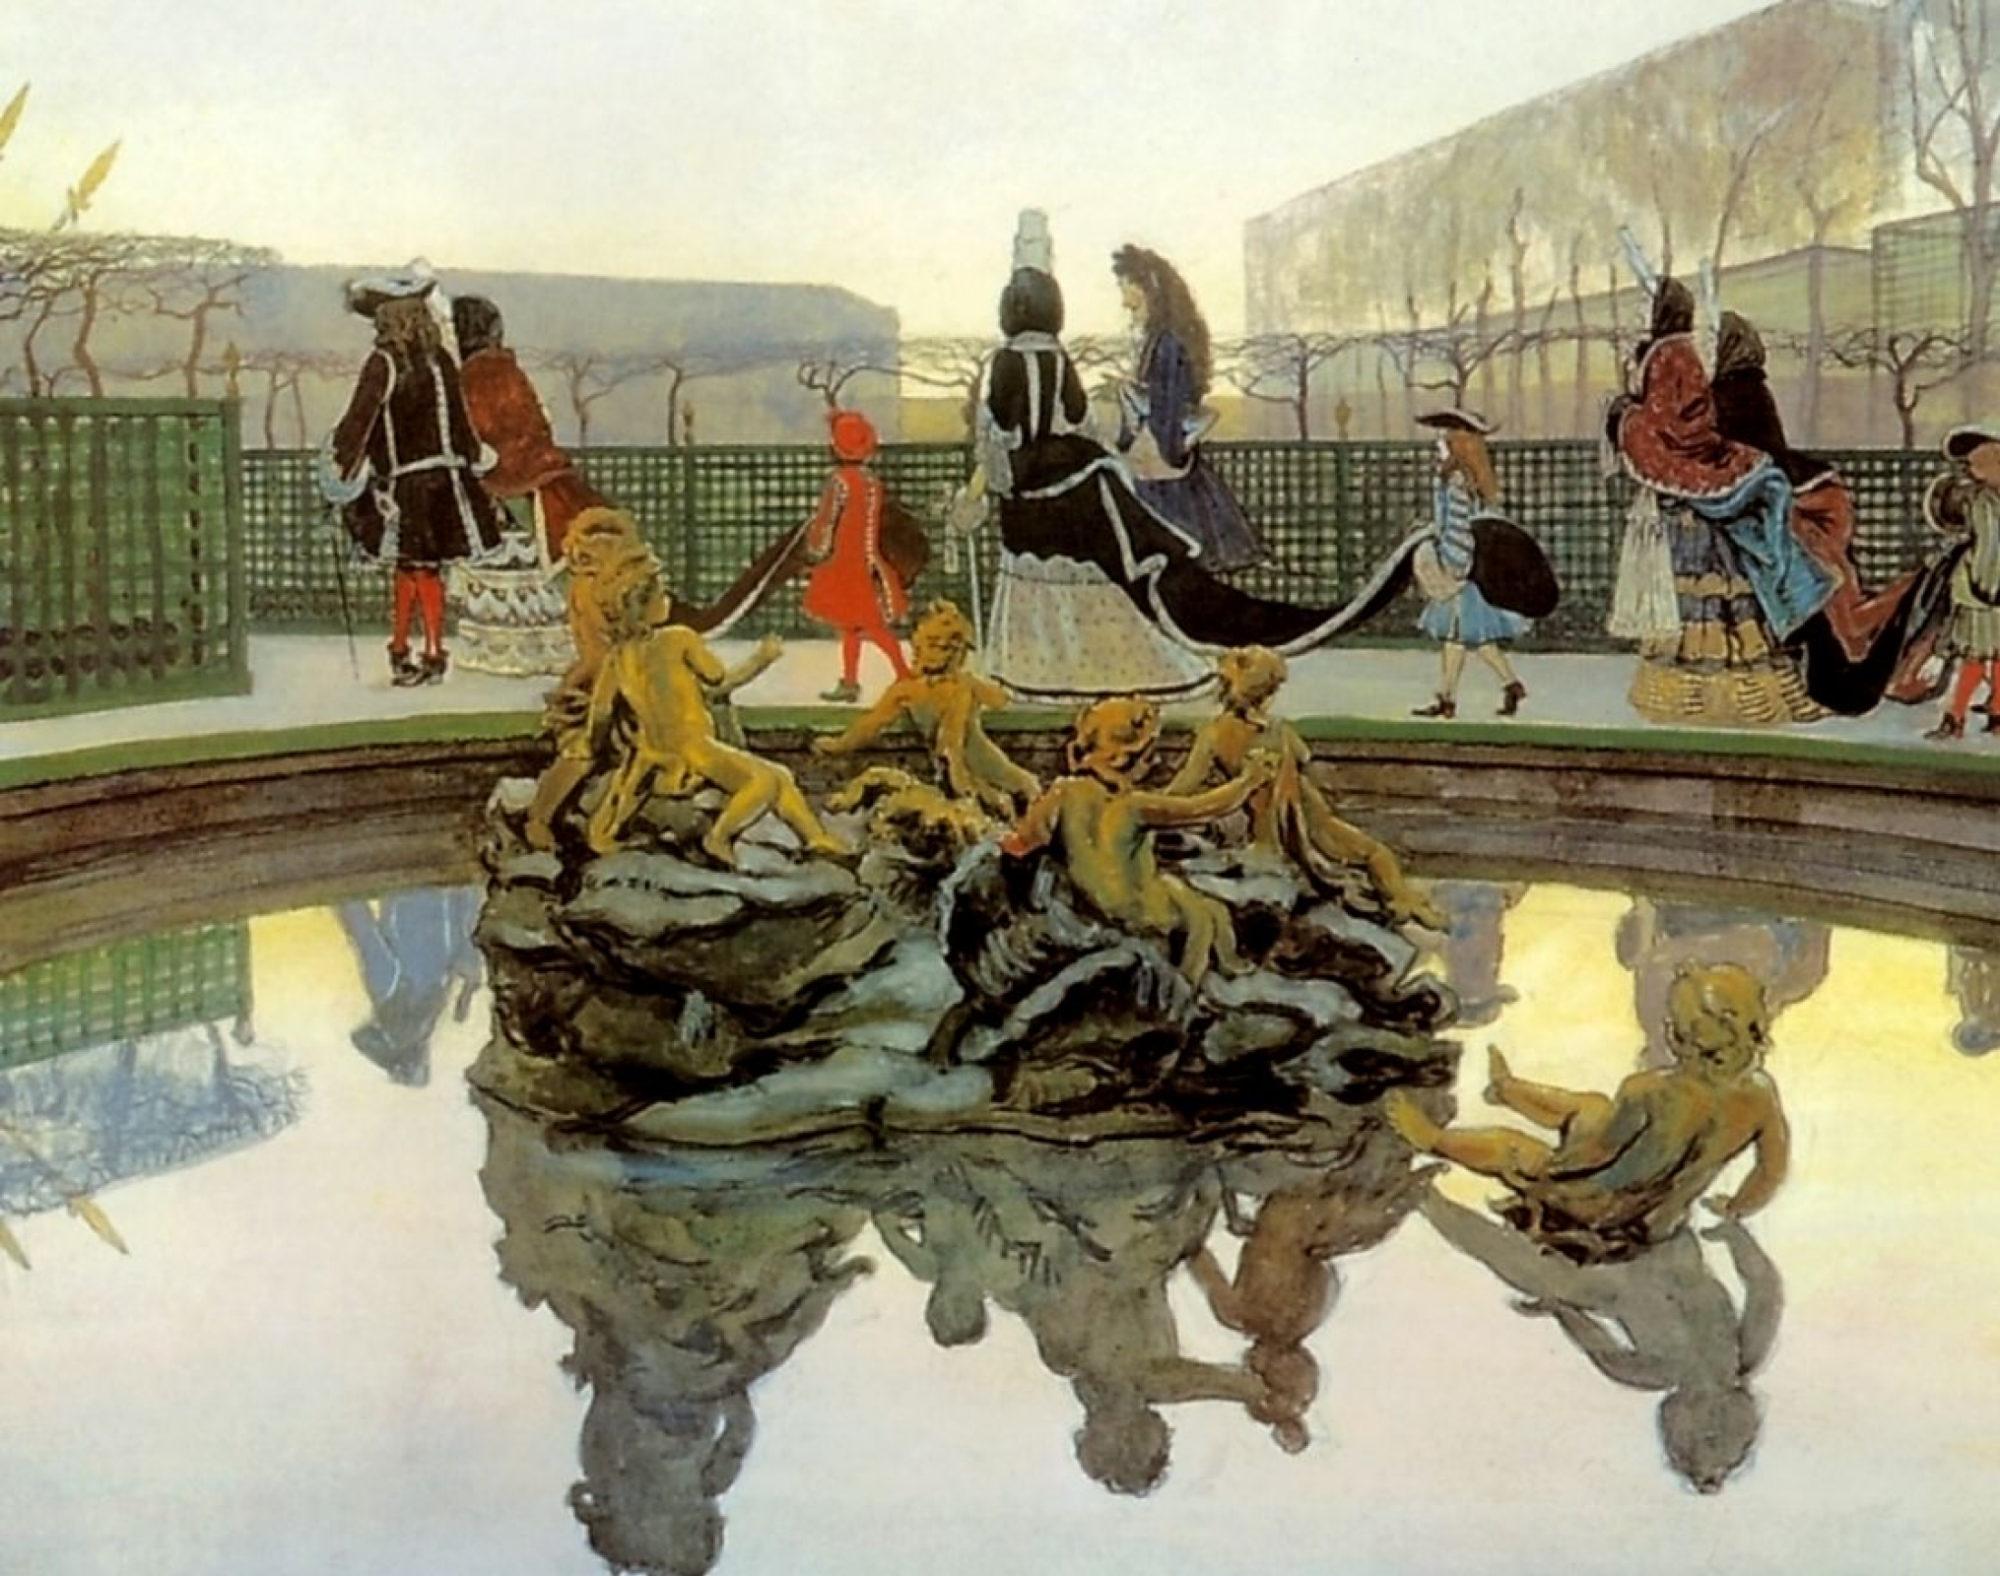 Александр Бенуа, 1906 год, картина «Прогулка короля»